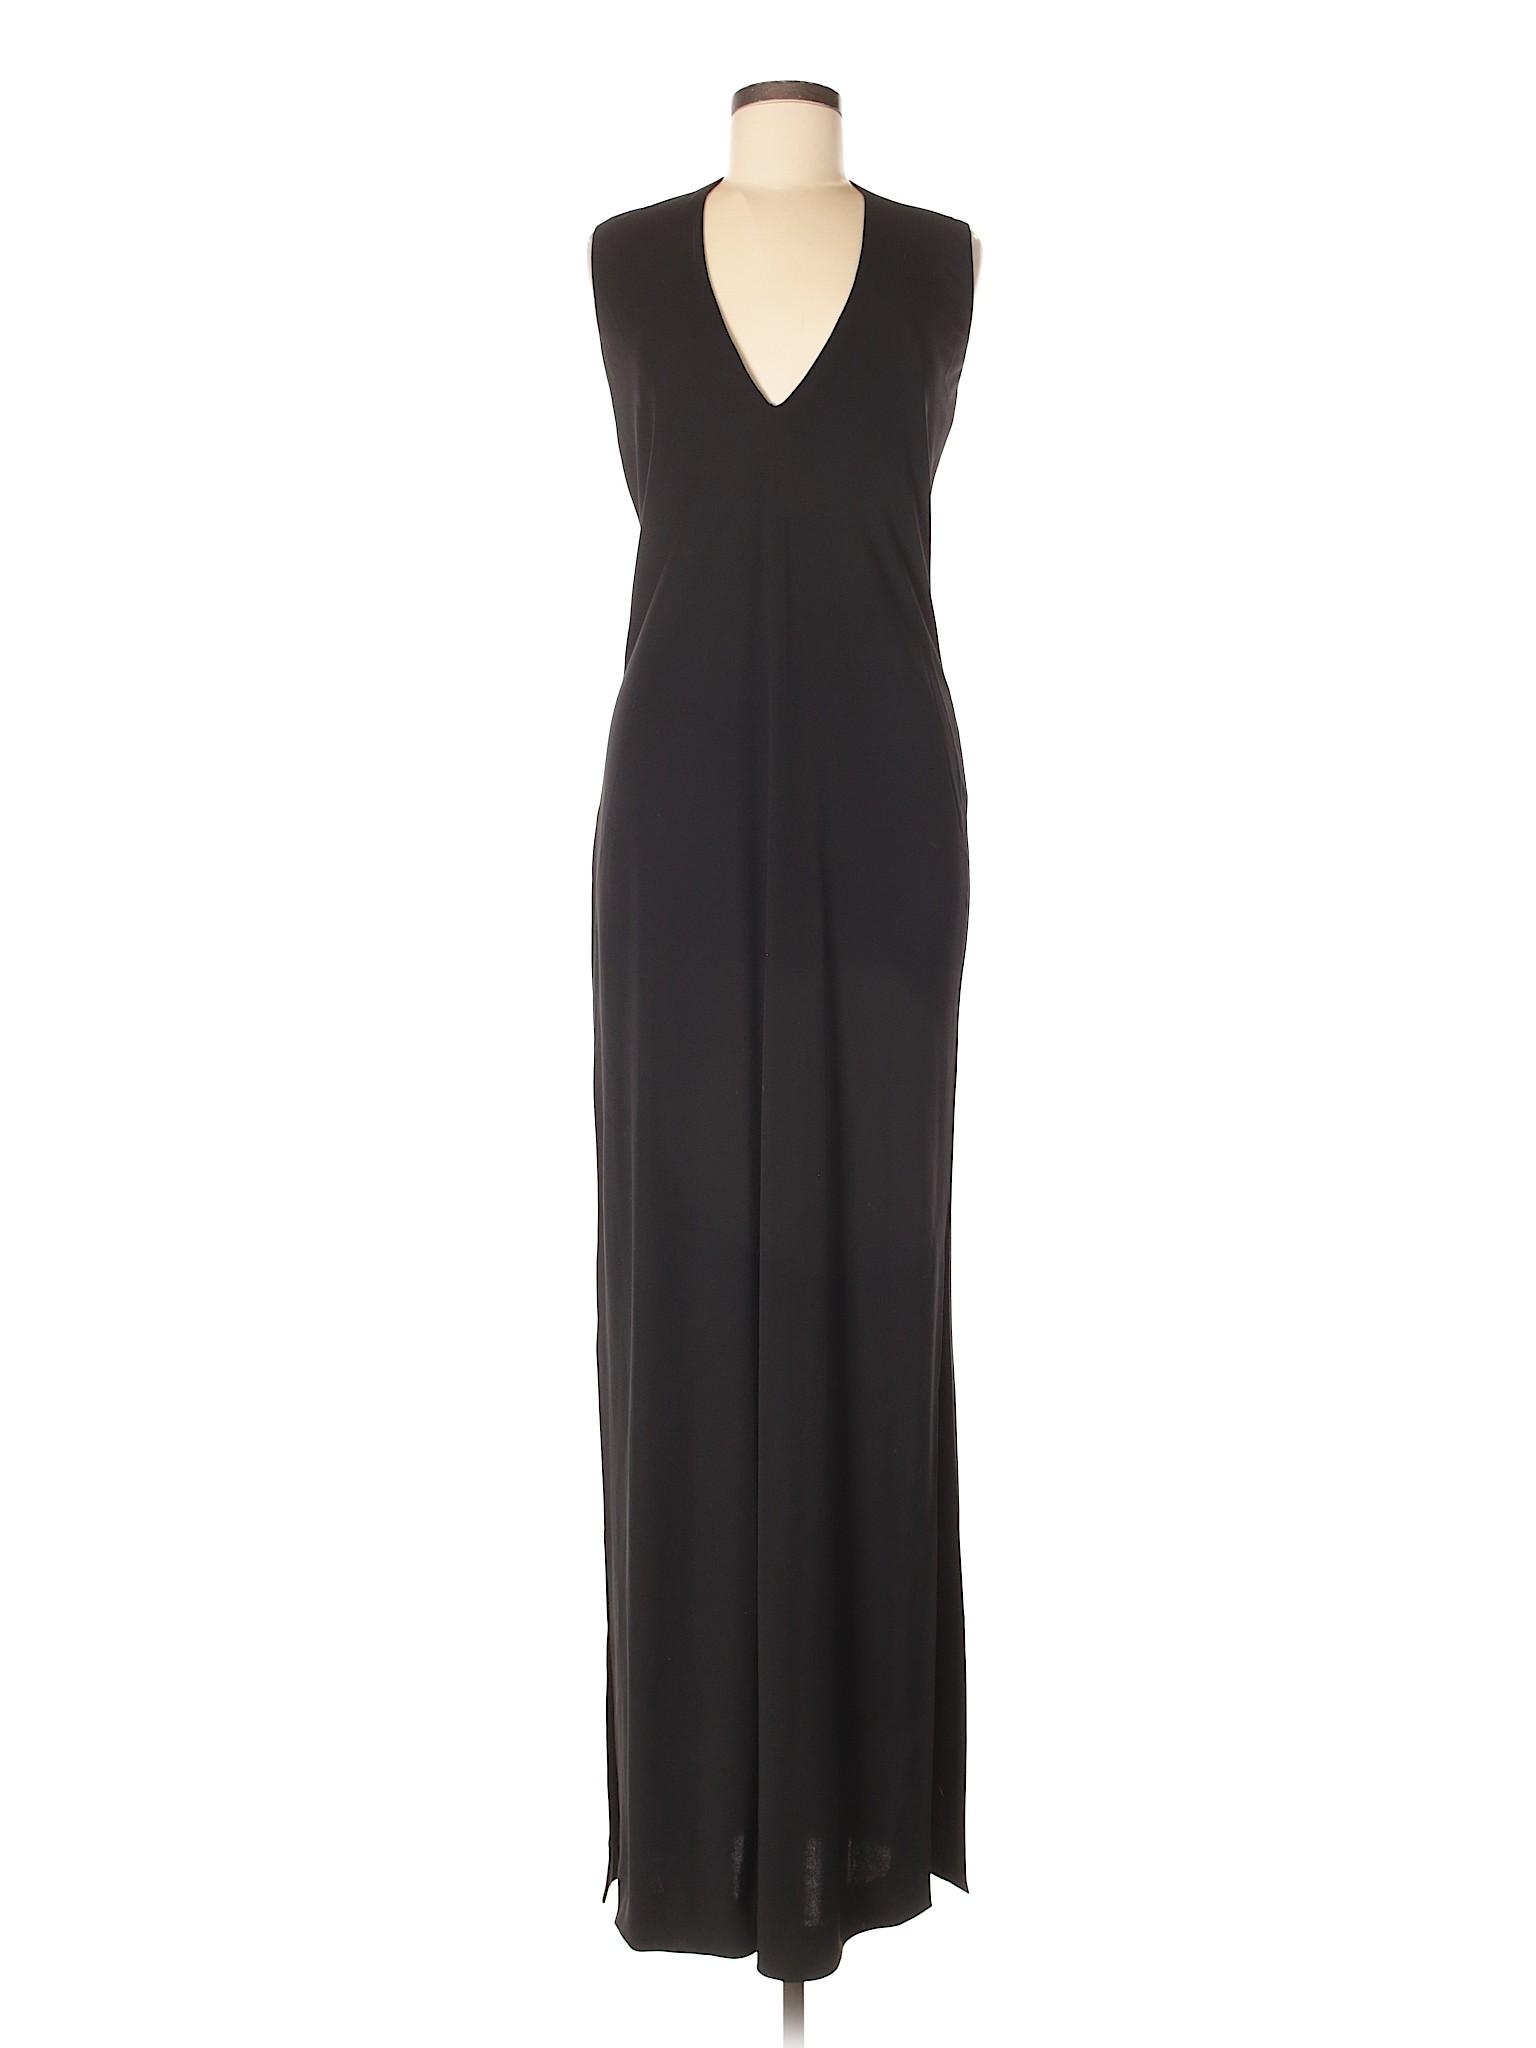 Casual Dress Ralph Lauren winter Boutique 5vIxtn8